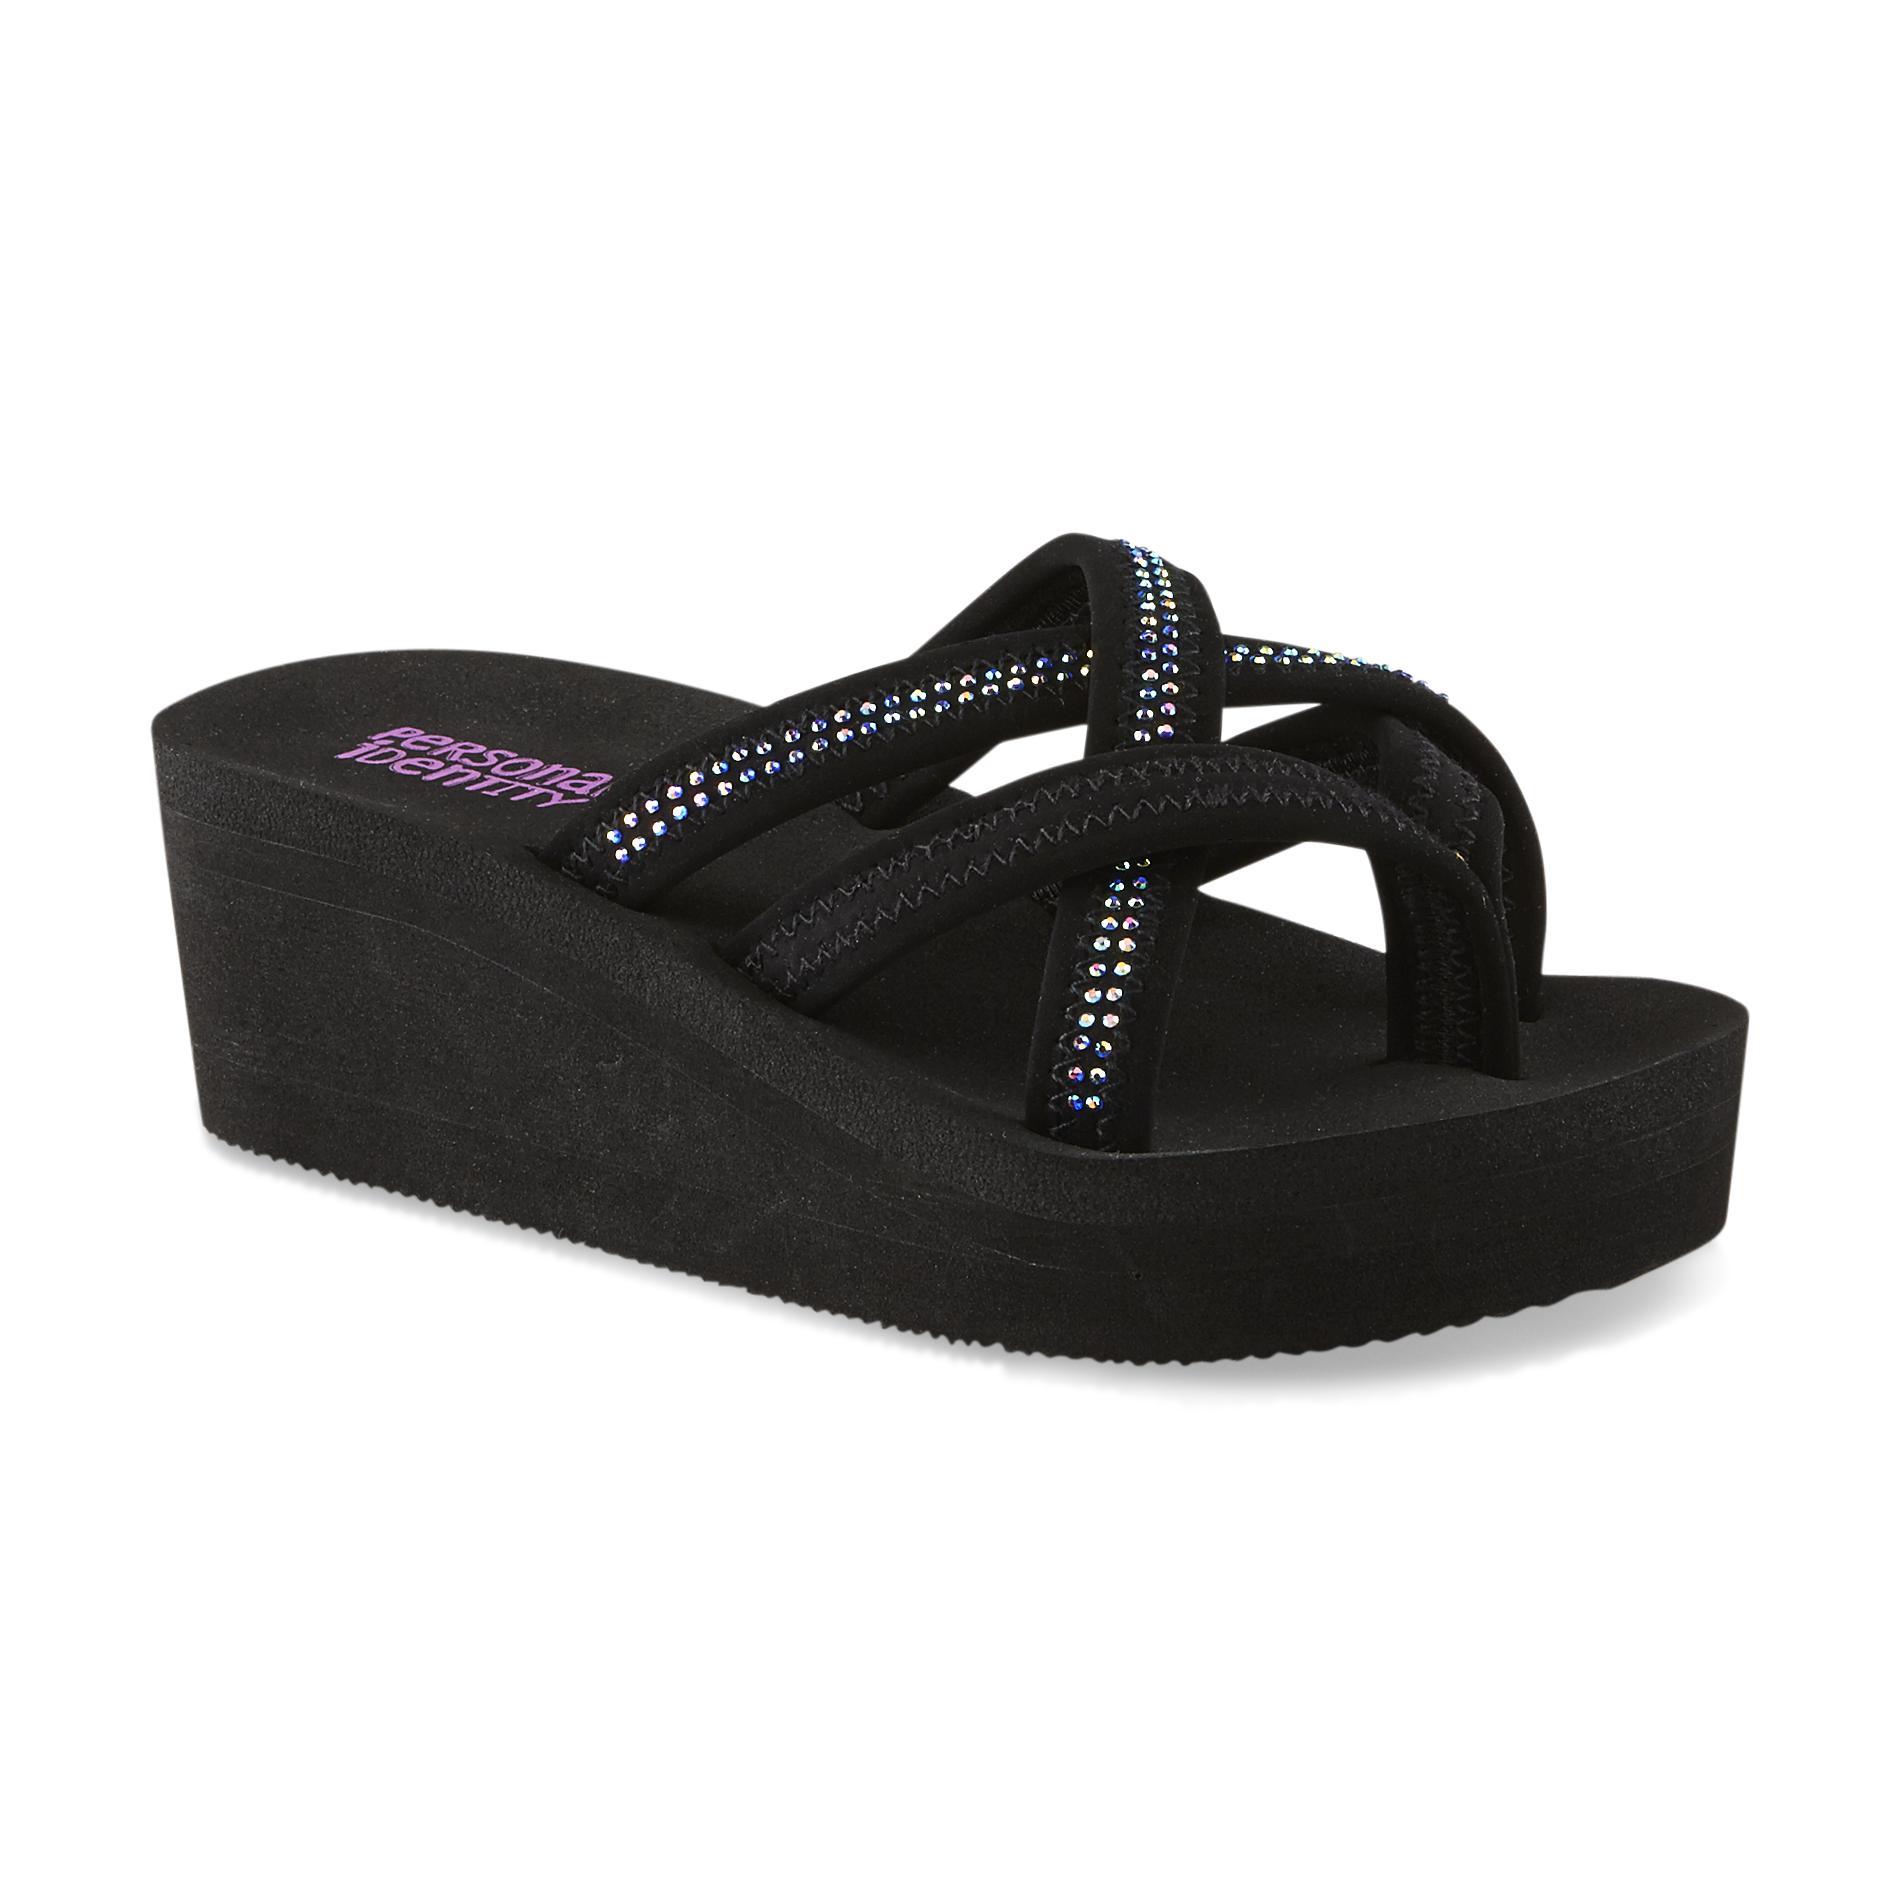 Personal Identity Girl's Tanya Black Embellished Wedge Flip-Flop